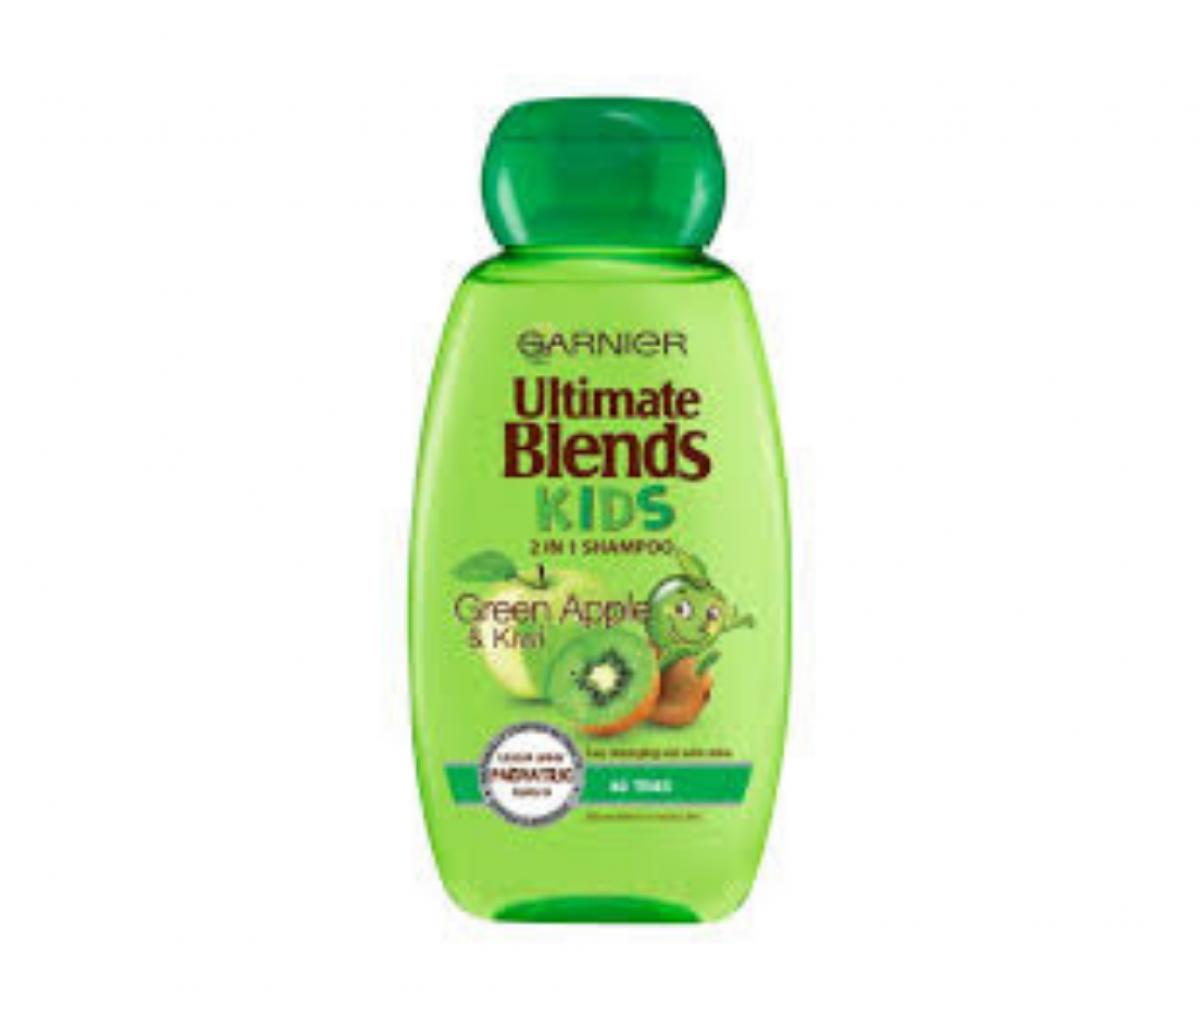 Garnier 250ml Blends Kids Green Apple & Kiwi Shampoo